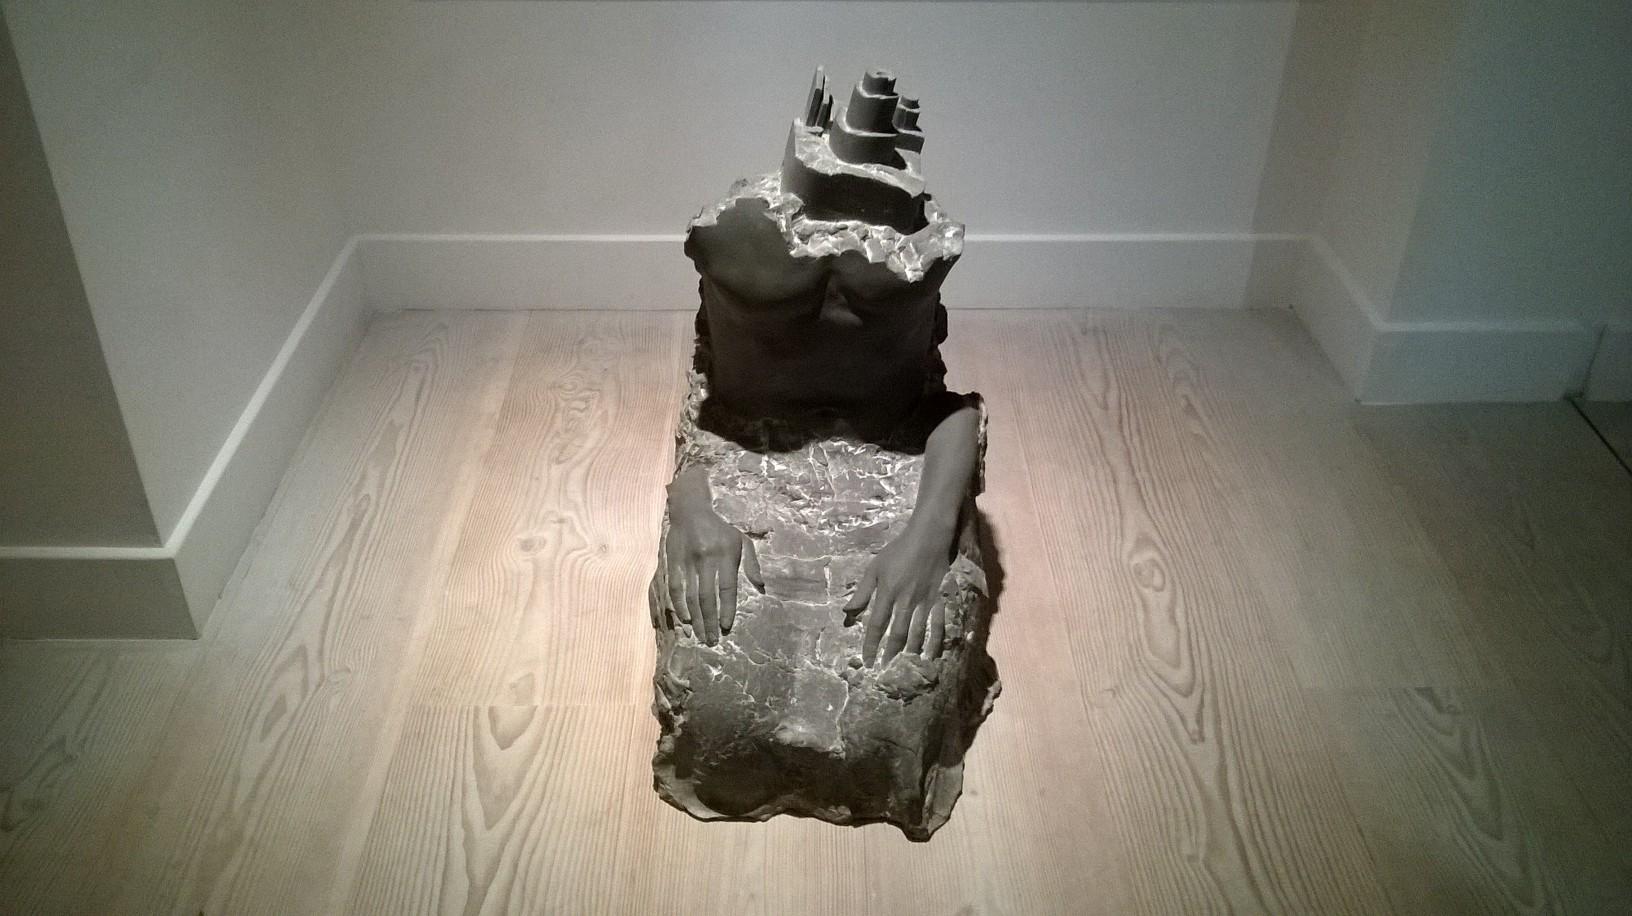 Recycle Group,  Enlightener 9 , 2015, Gazelli Art House.